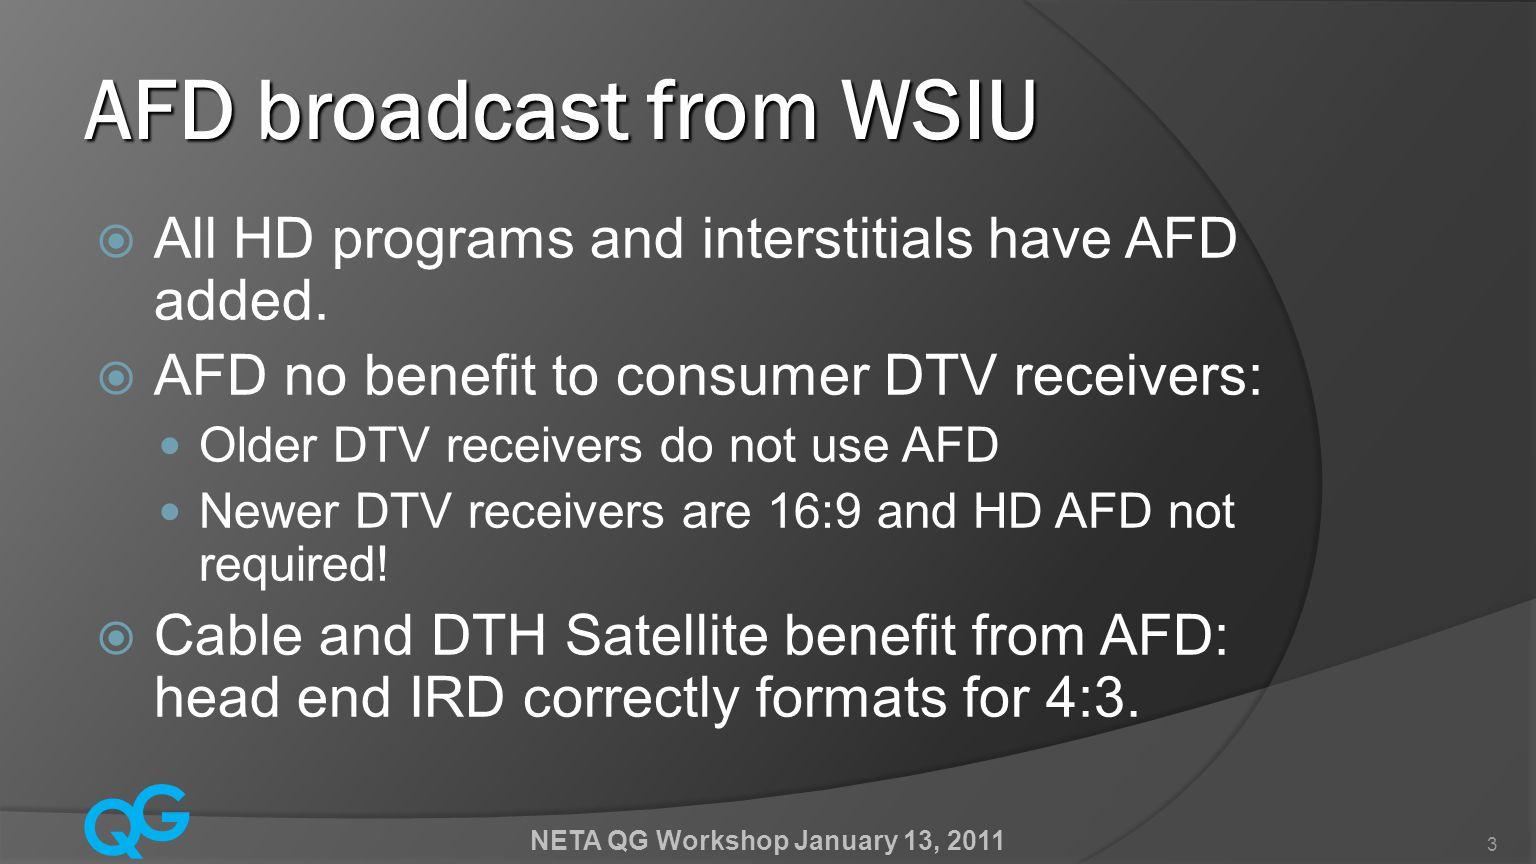 Q G NETA QG Workshop January 13, 2011 24 WSIU Playlist SVR1A – HD Playback SVR1B – SD Playback Formats for SVR1B (SD) NS = 4:3 Full Frame LB = 4:3,16:9 Letterbox WS=16:9 Full Frame PB =16:9,4:3 Pillarbox AFD for SVR1A (HD) -from HD File AFD for SVR1B (SD) NS = 9 (1001) LB = 8 (1000) WS = 8 (1000) PB = 9 (1001)